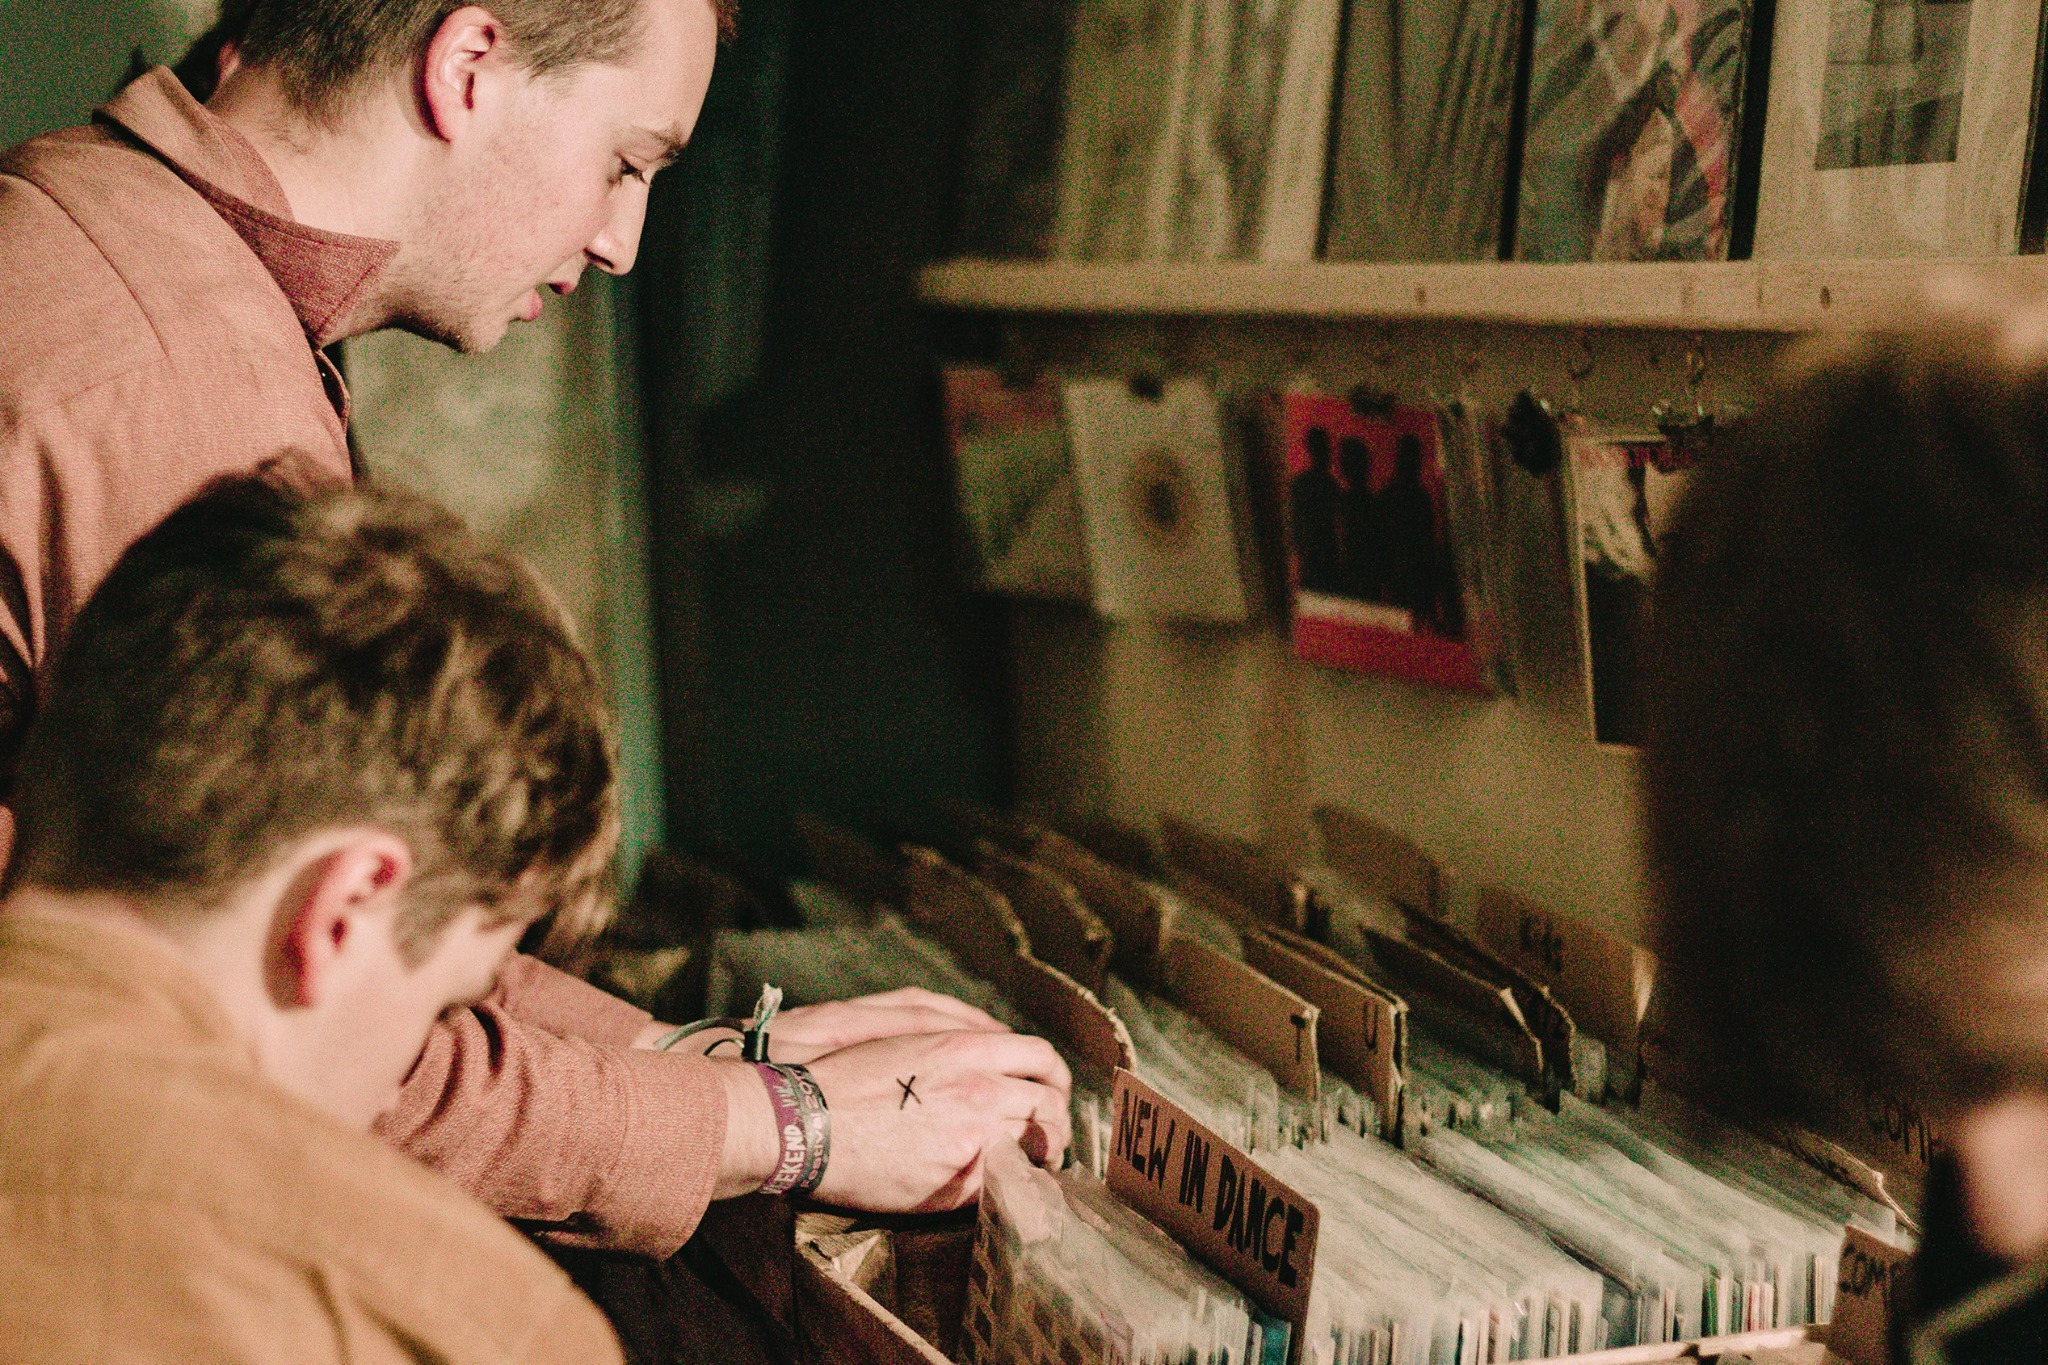 Vinyl records have recently had a boom in sales